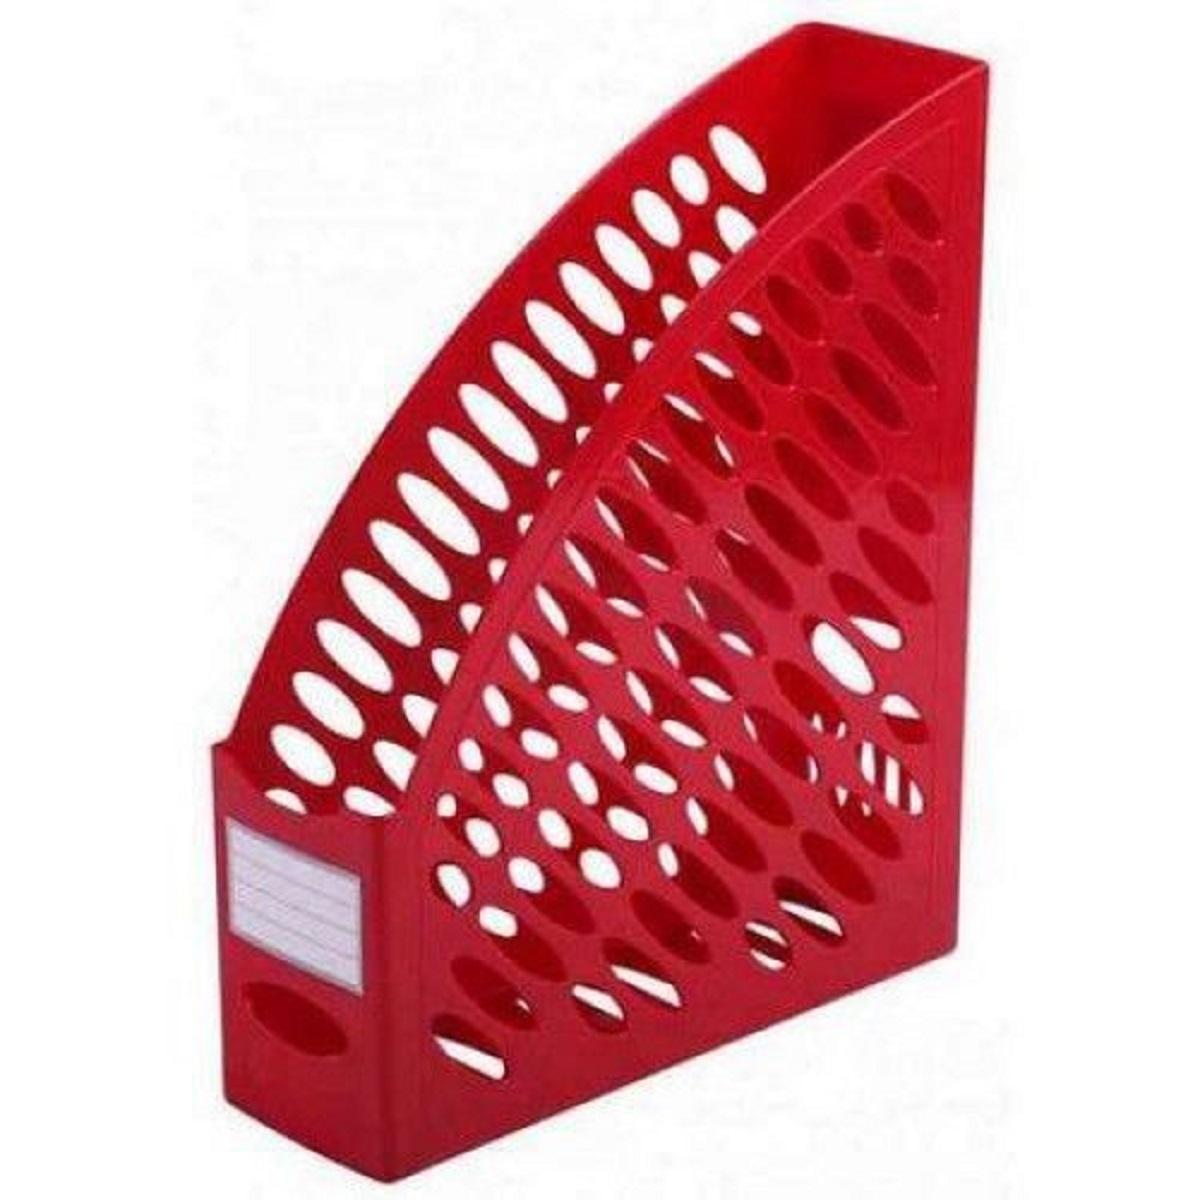 Suport vertical plastic rosu Ark 2050/R